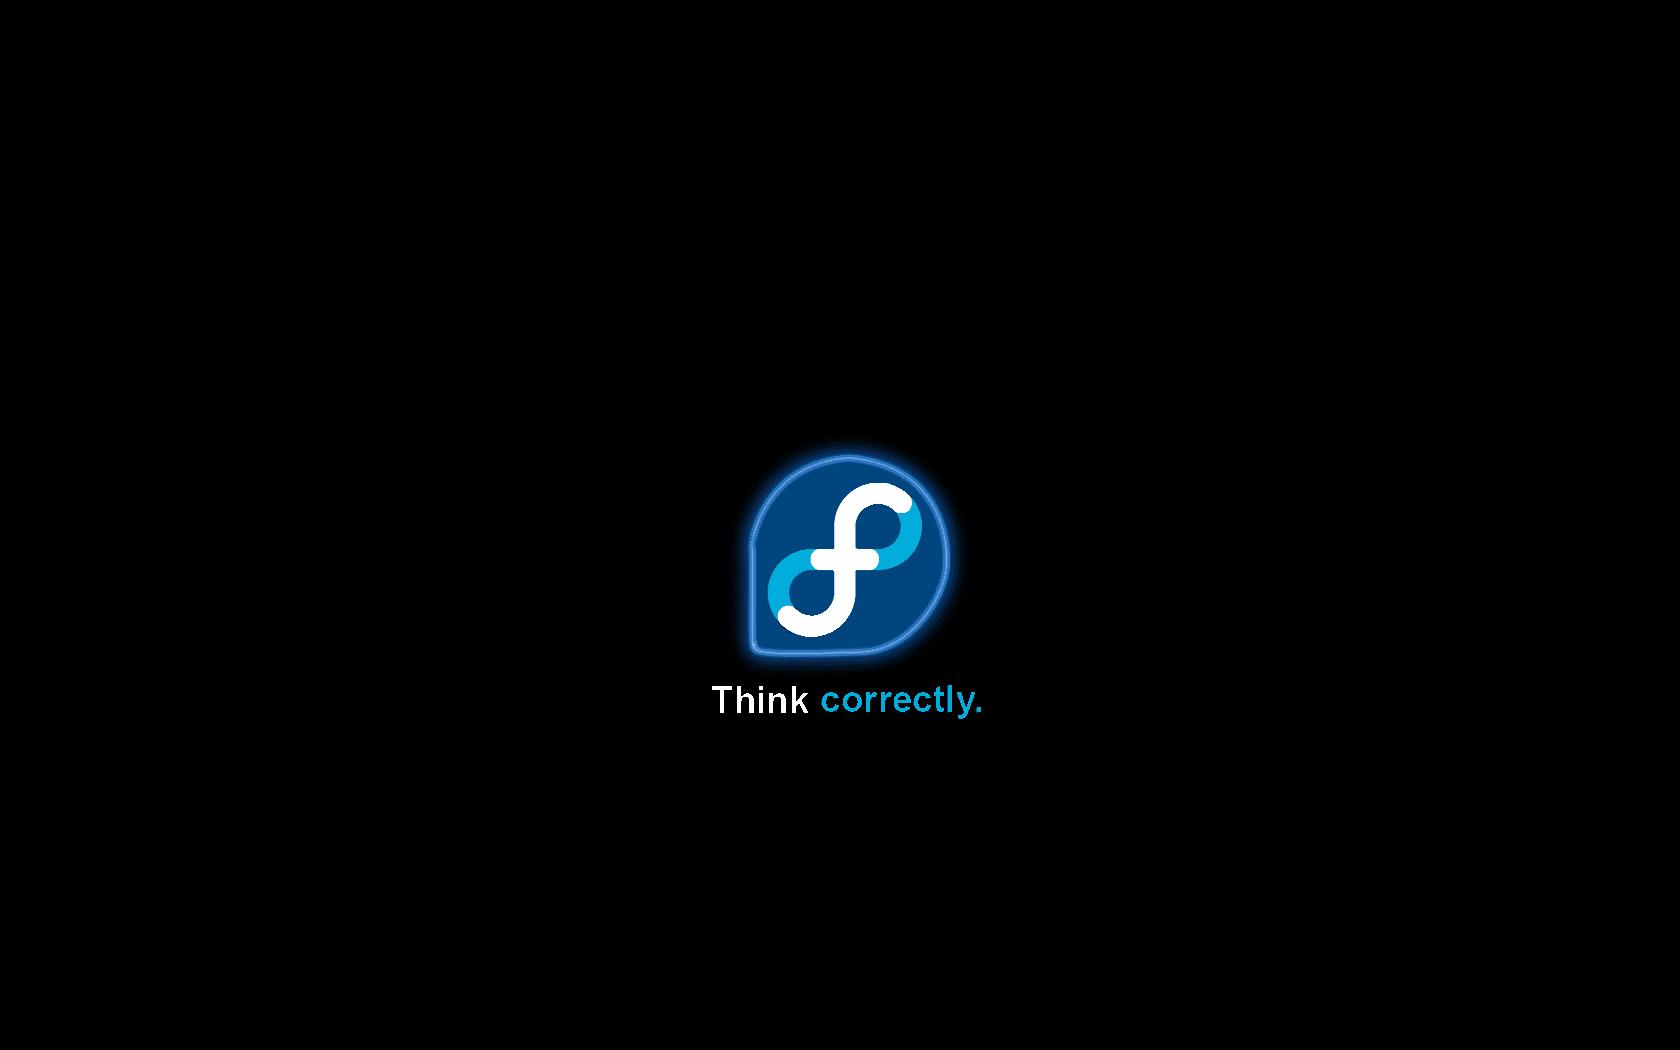 fedoraByIvanLinux